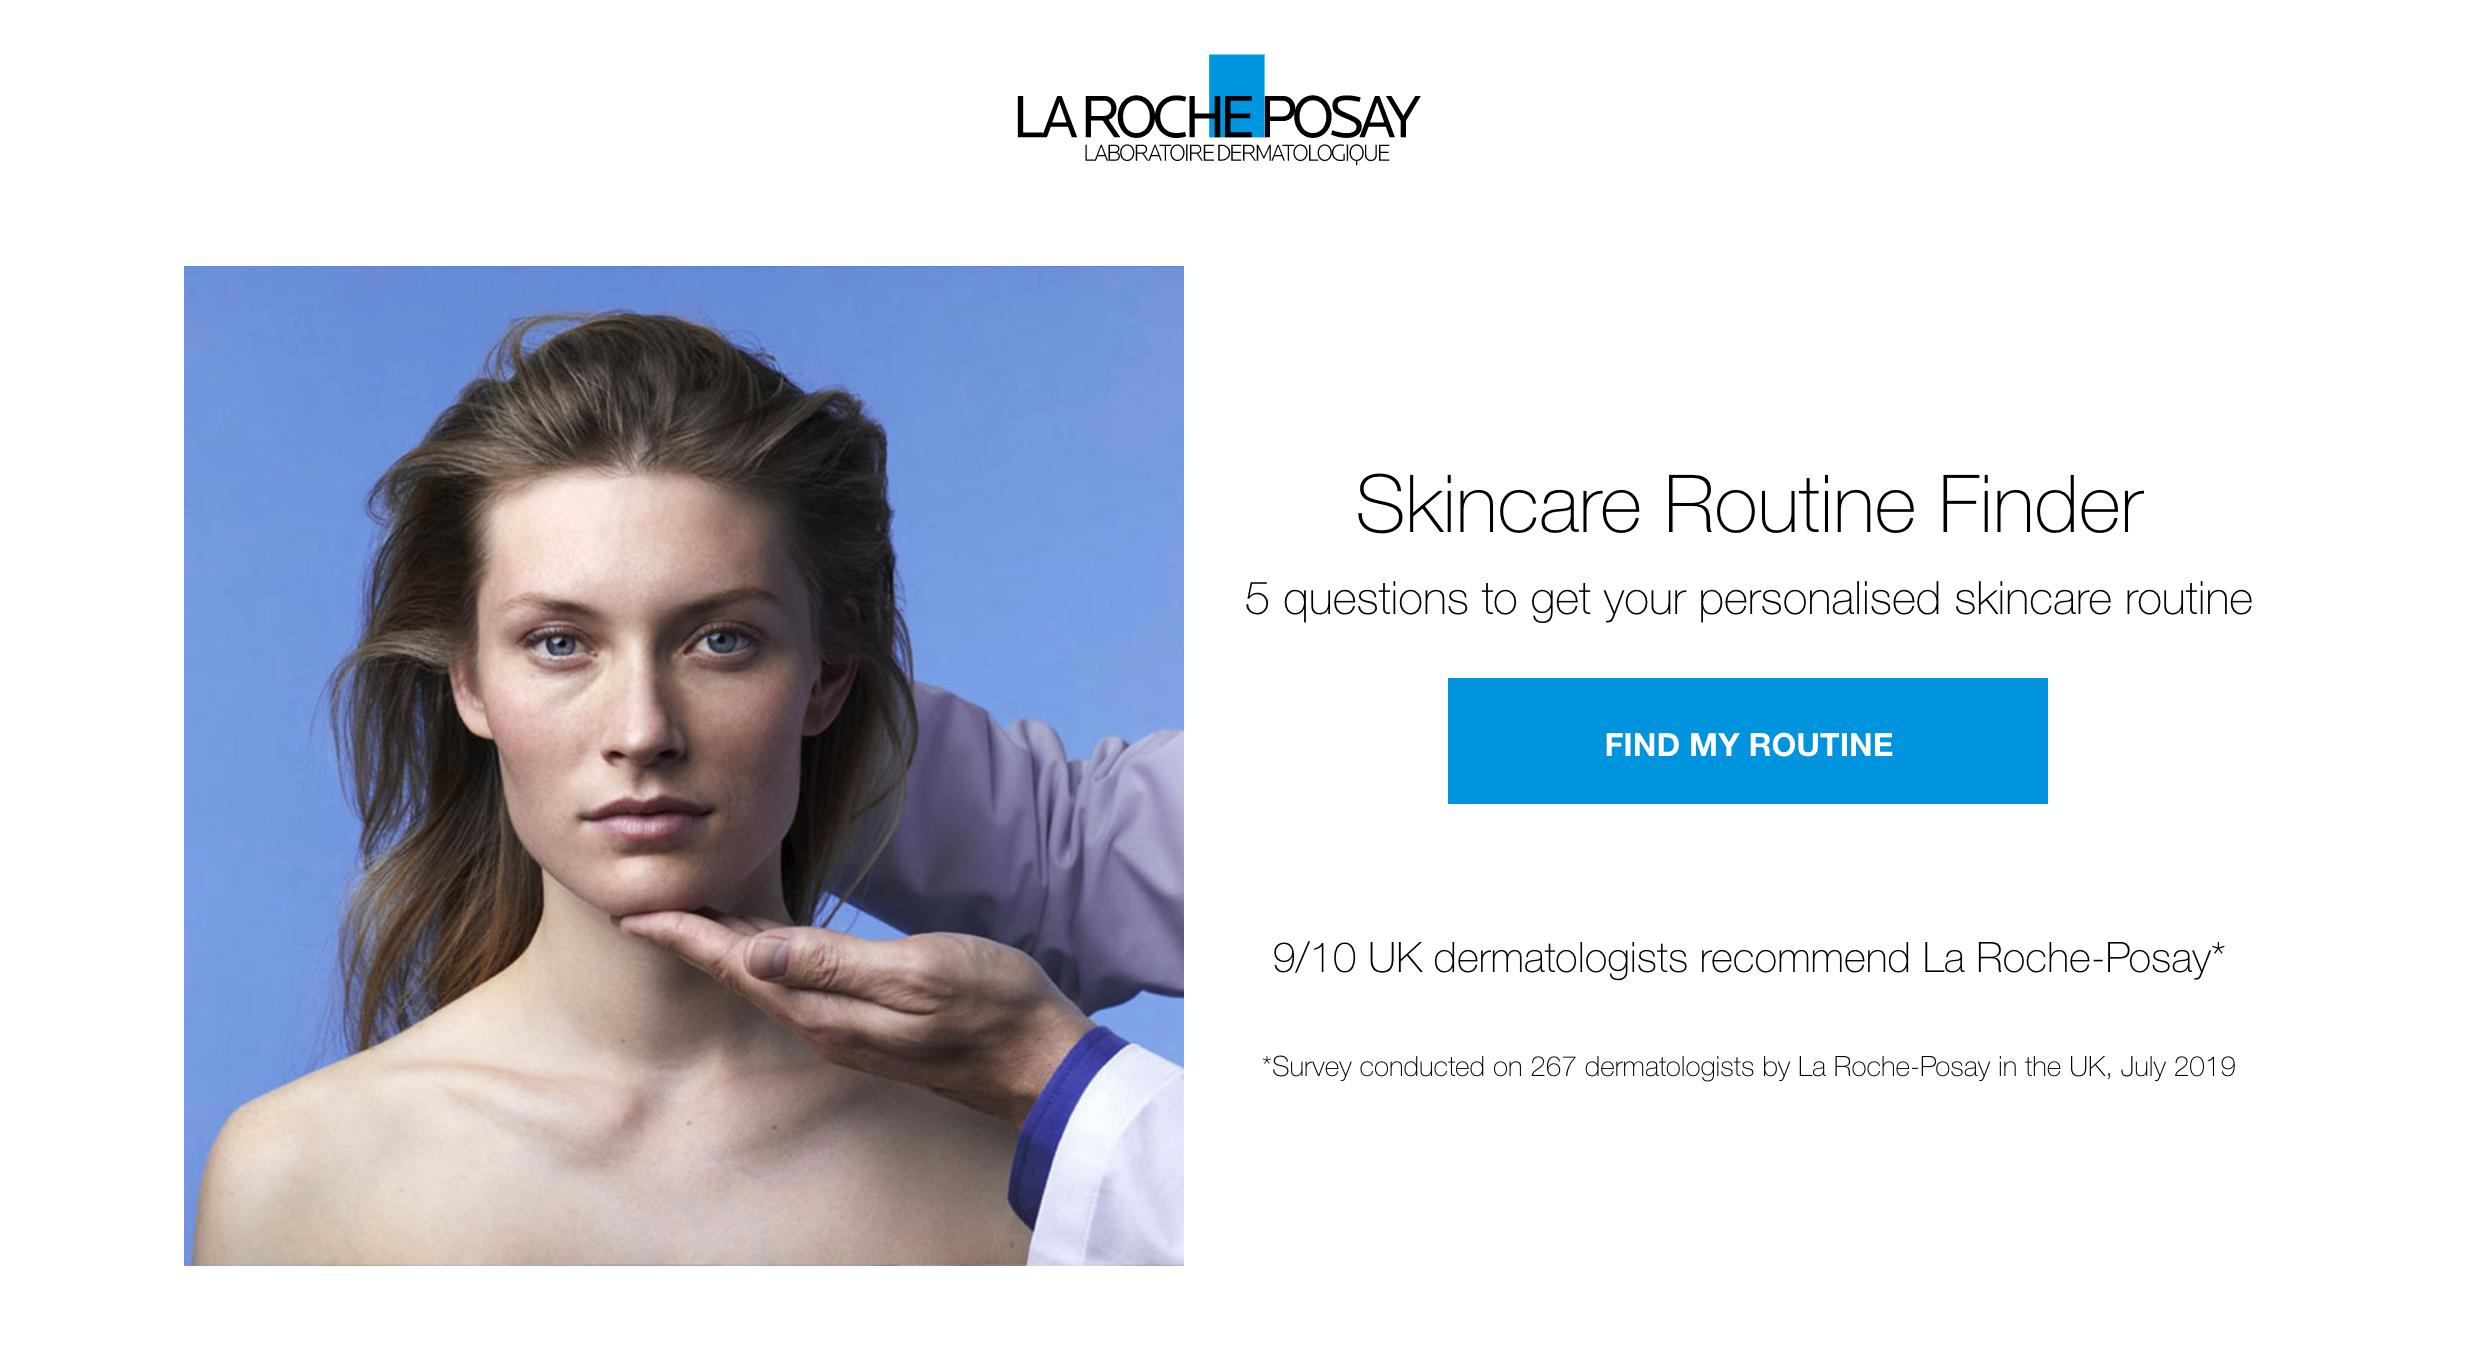 Case Study: L'OréalUK Active Cosmetics